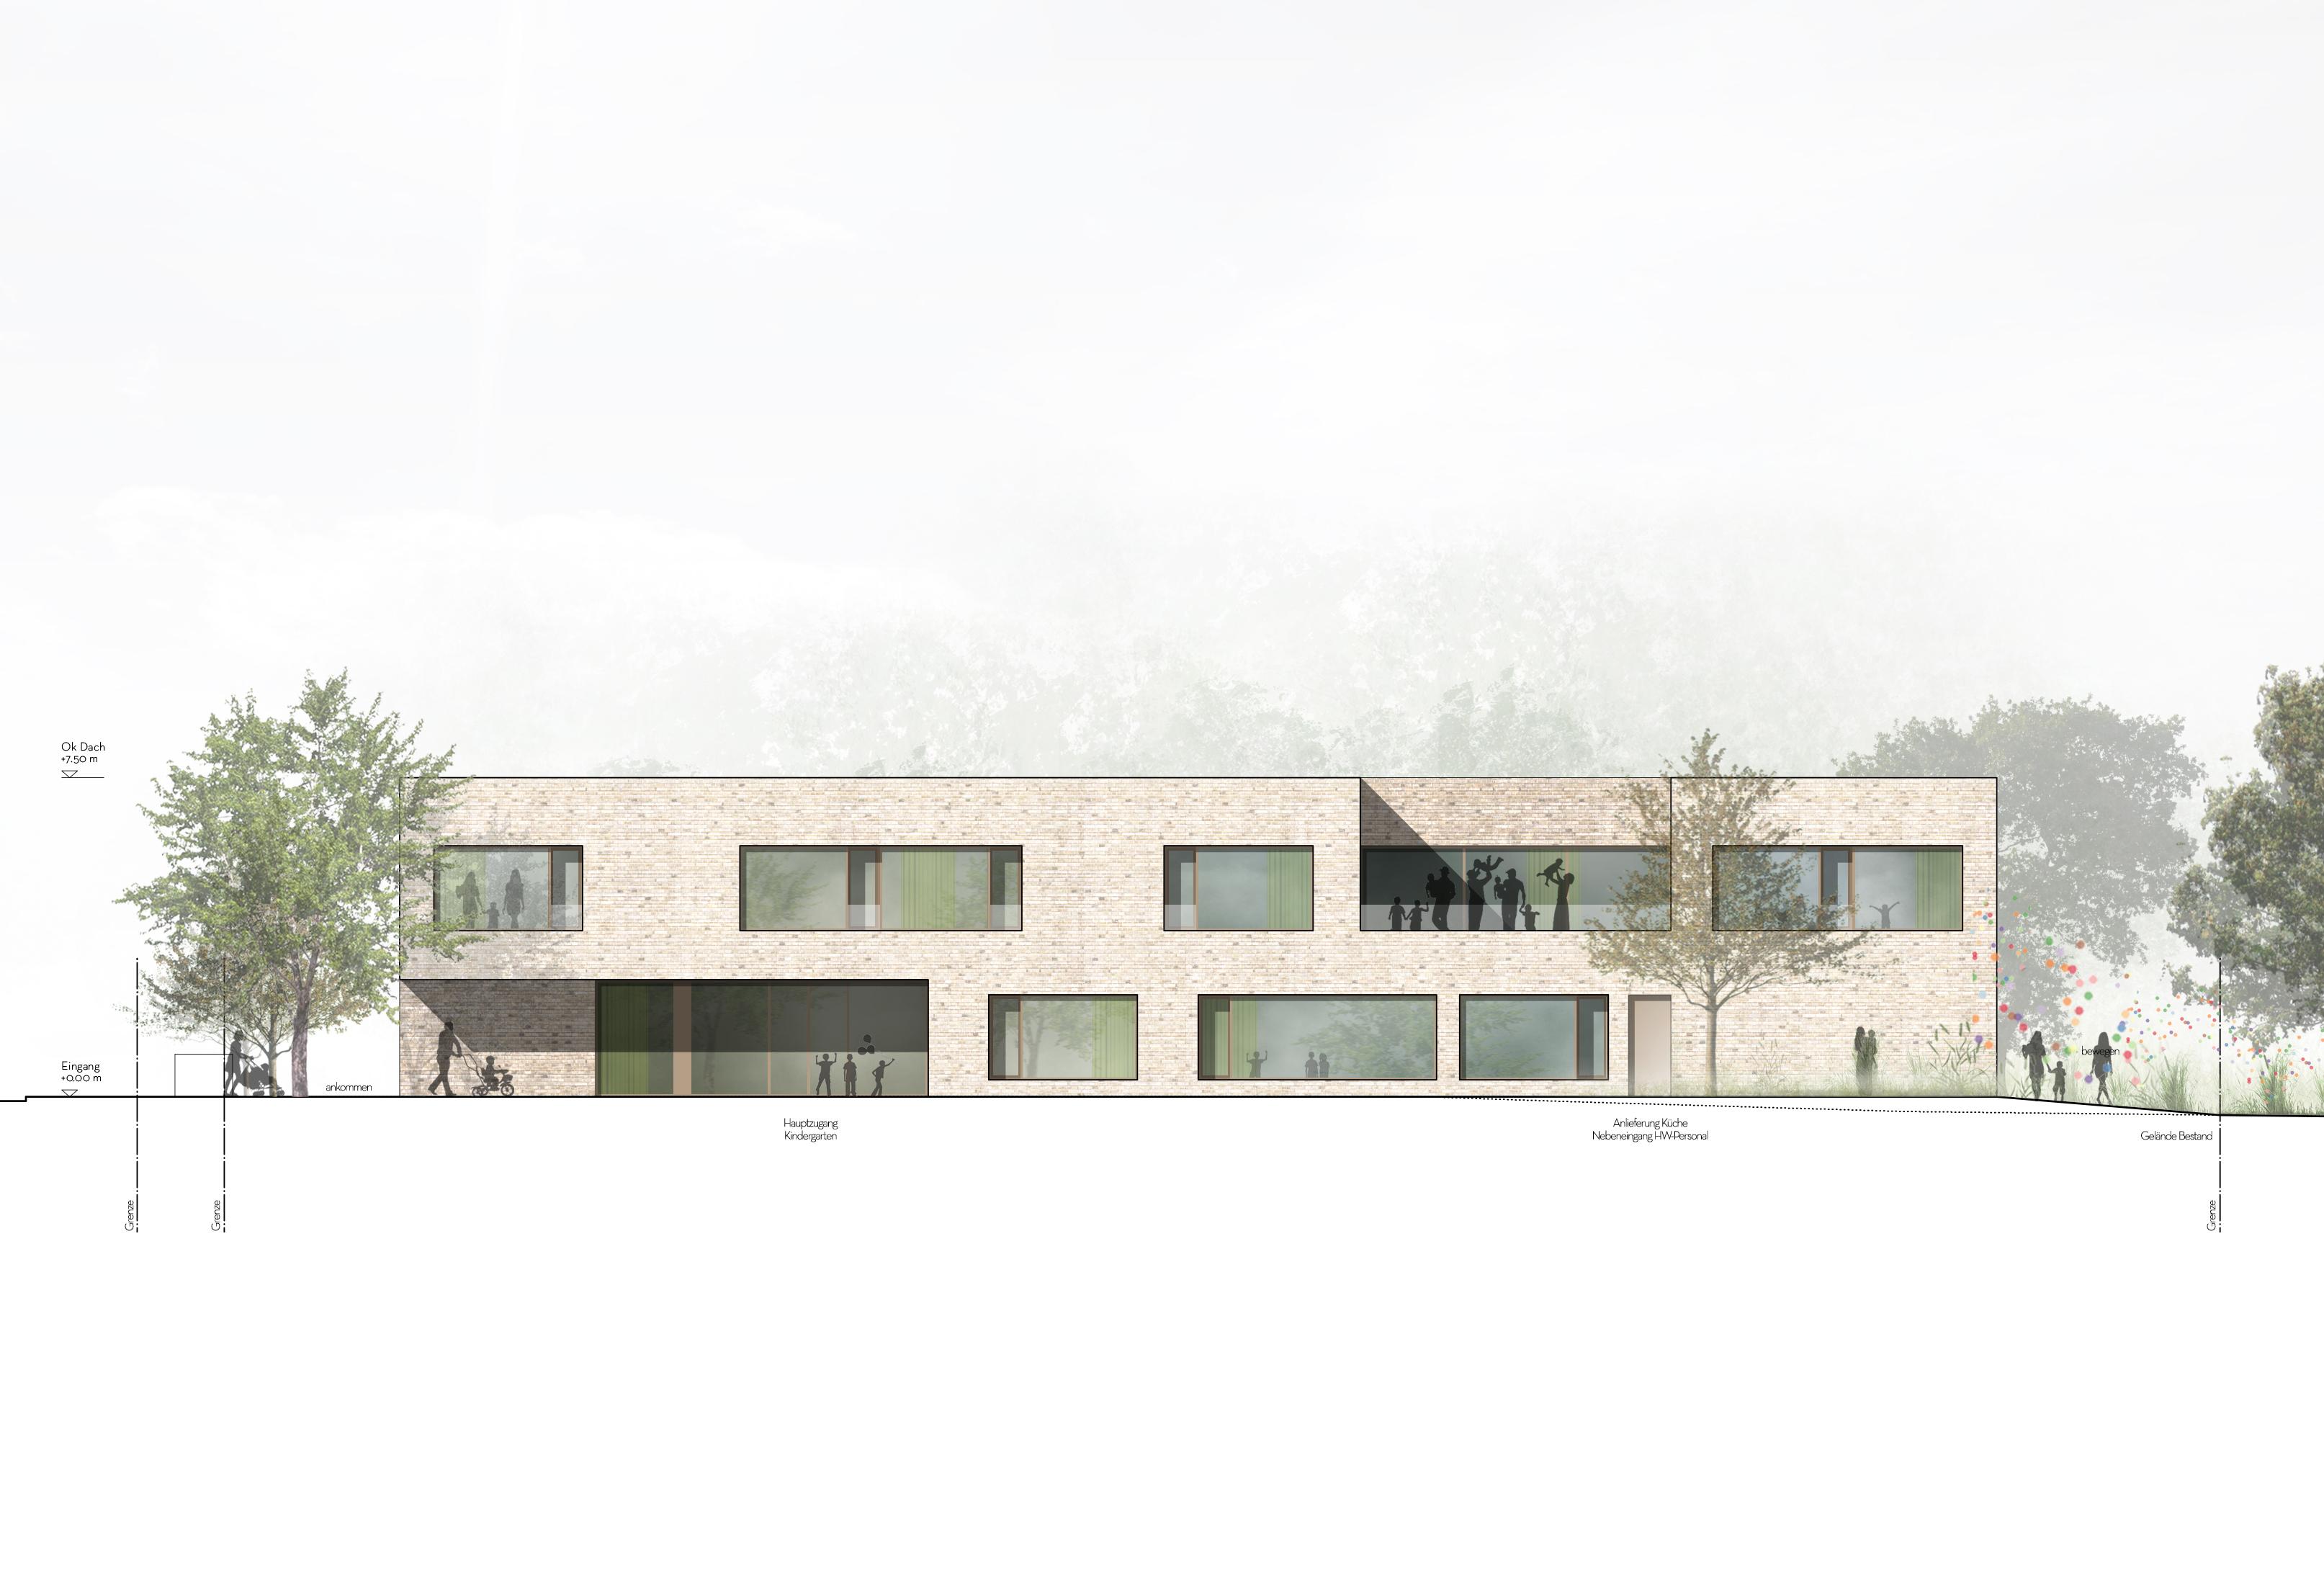 kaestle&ocker - Neubau kath. Kindertagesstätte Mariä Himmelfahrt